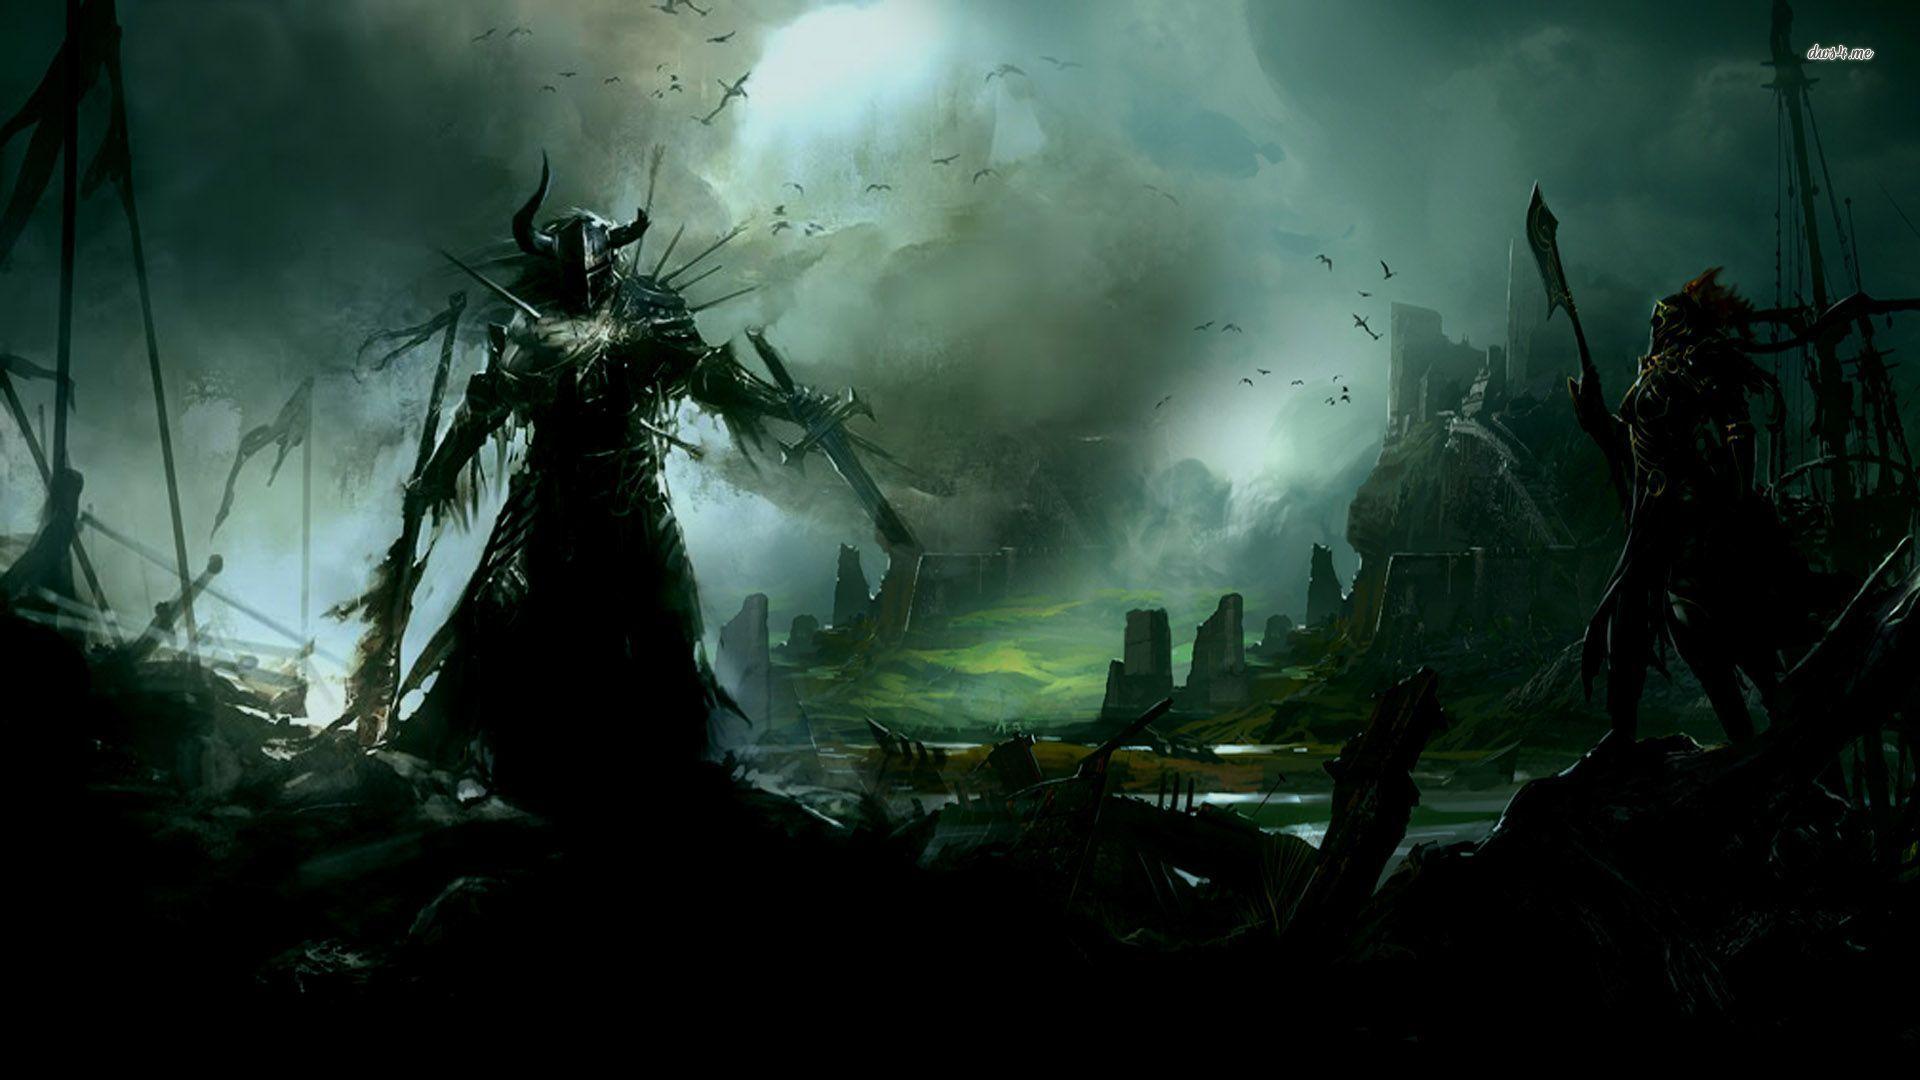 abaddon guild wars wallpaper - photo #29